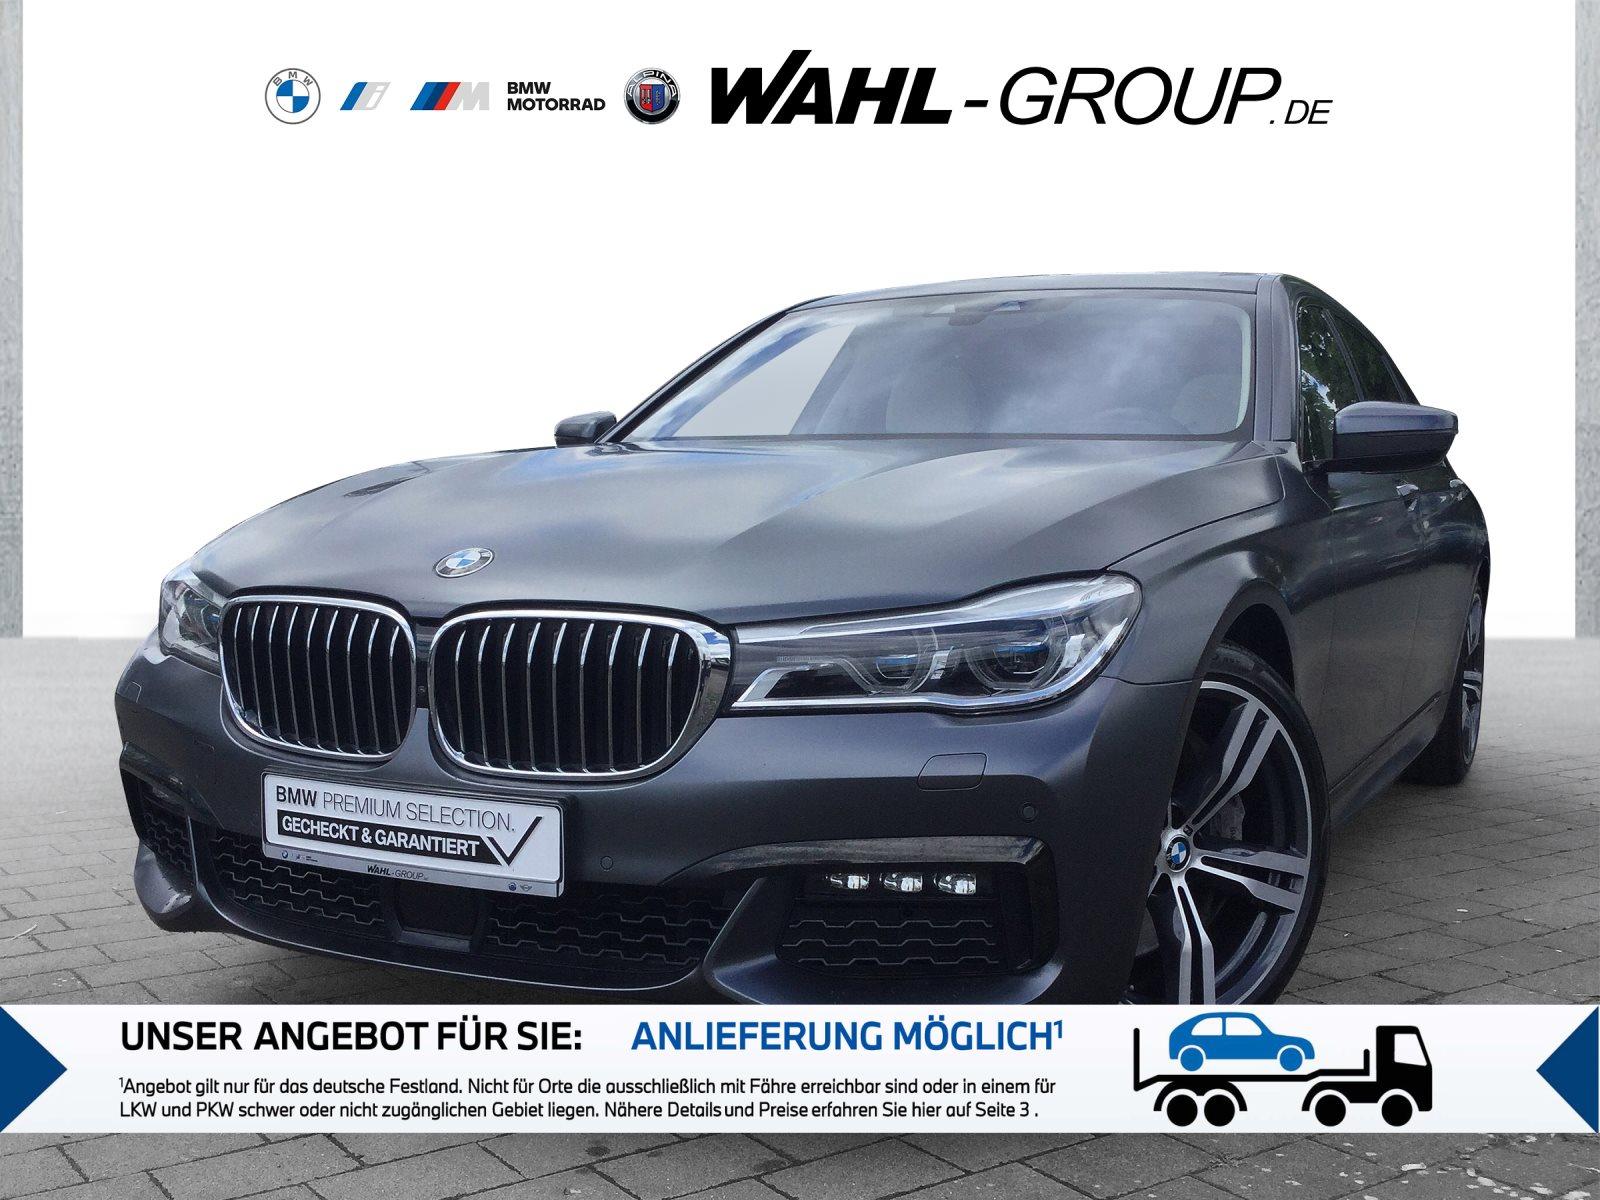 BMW 750i Li xDrive M Sportpaket Touch Command Head-Up, Jahr 2018, Benzin